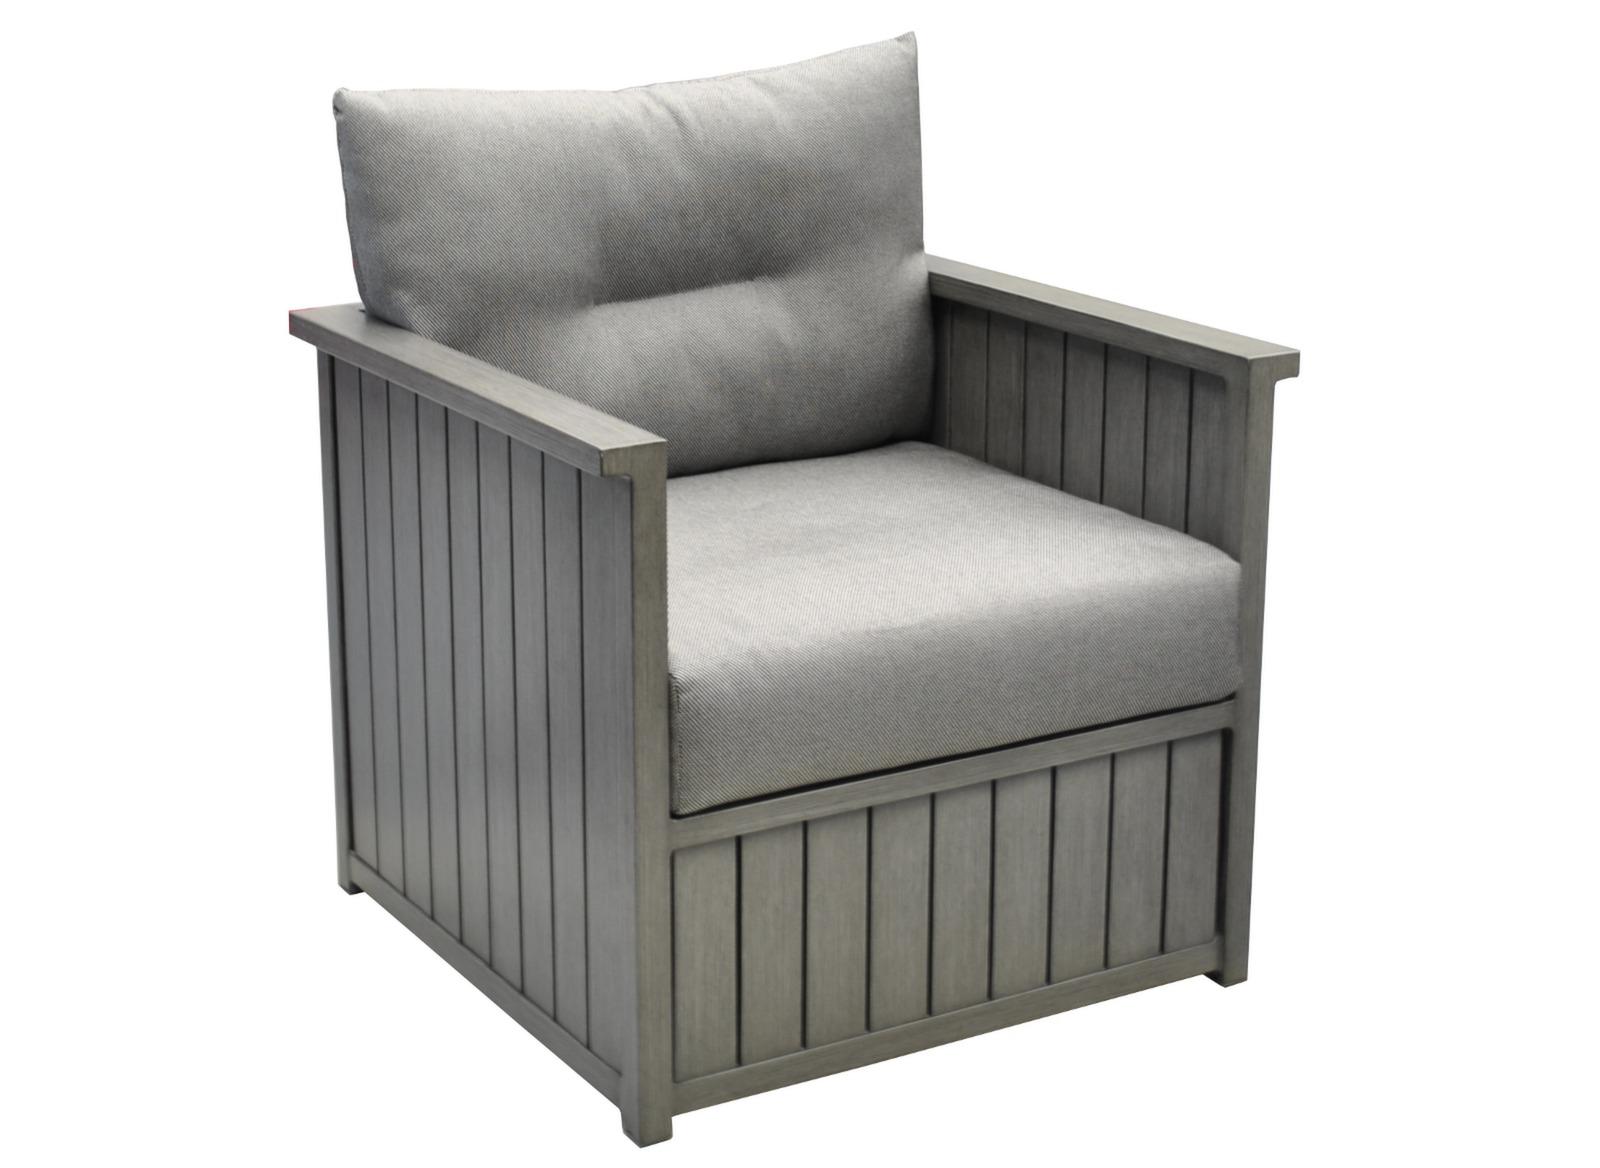 fauteuil de jardin en aluminium milano meubles jardin proloisirs. Black Bedroom Furniture Sets. Home Design Ideas